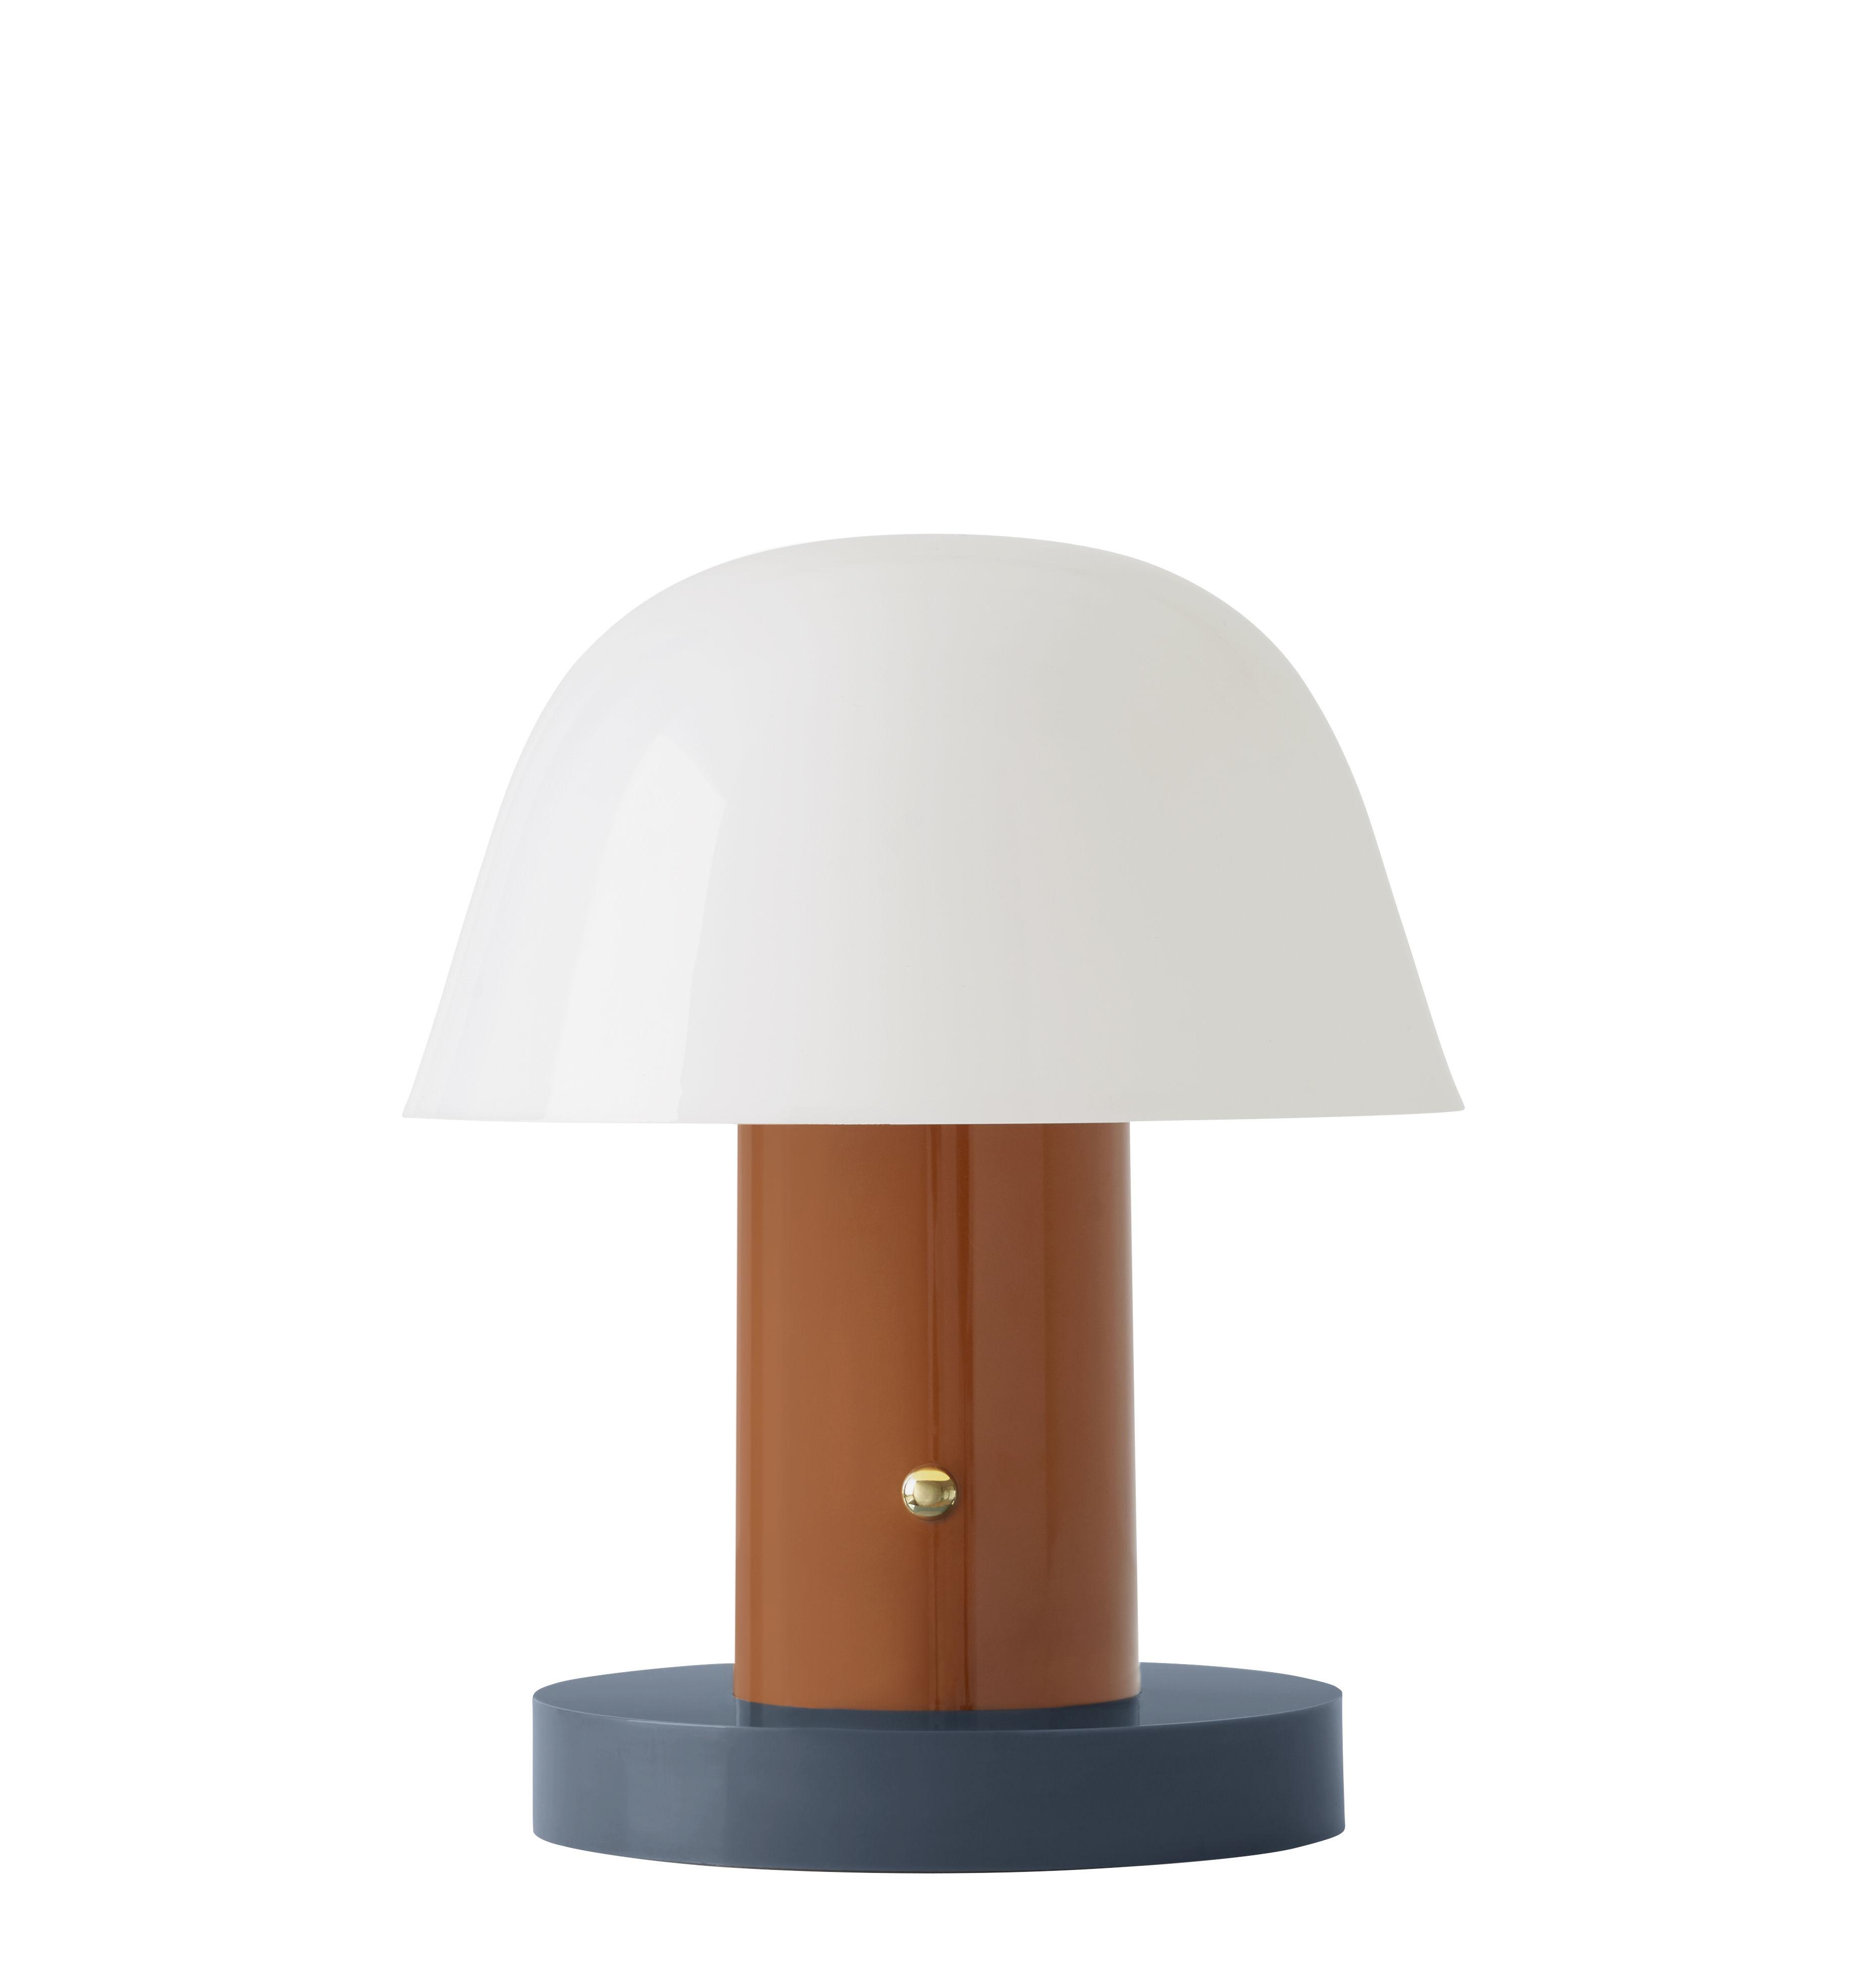 Leuchten - Tischleuchten - Setago  JH27 Lampe ohne Kabel / LED - by Jaime Hayon - &tradition - Rostrot / Blauer Sockel - Polycarbonate moulé